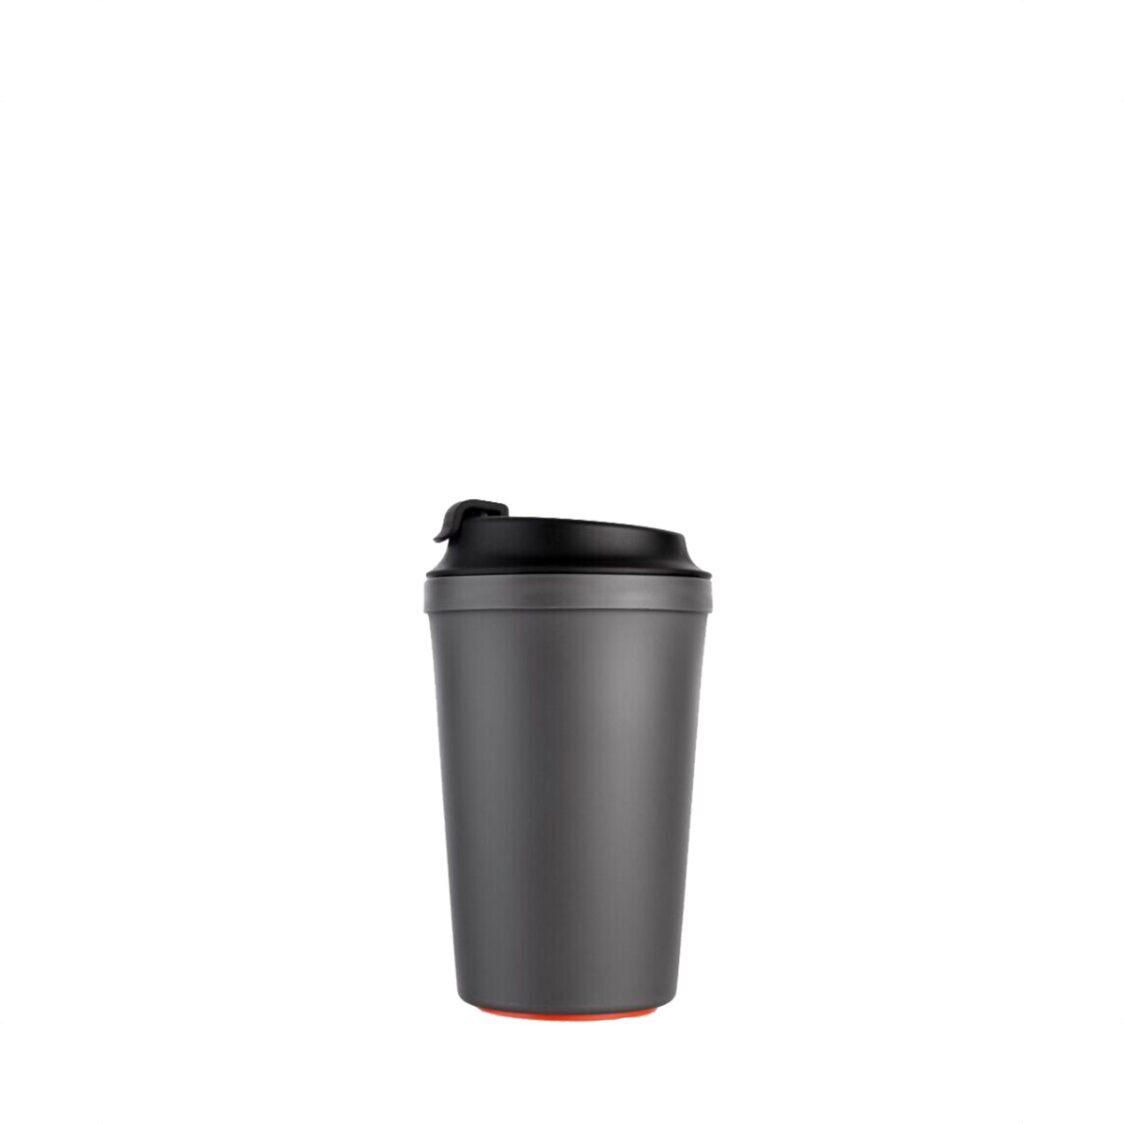 Artiart Suction Idea Caf Mug Grey 340ml